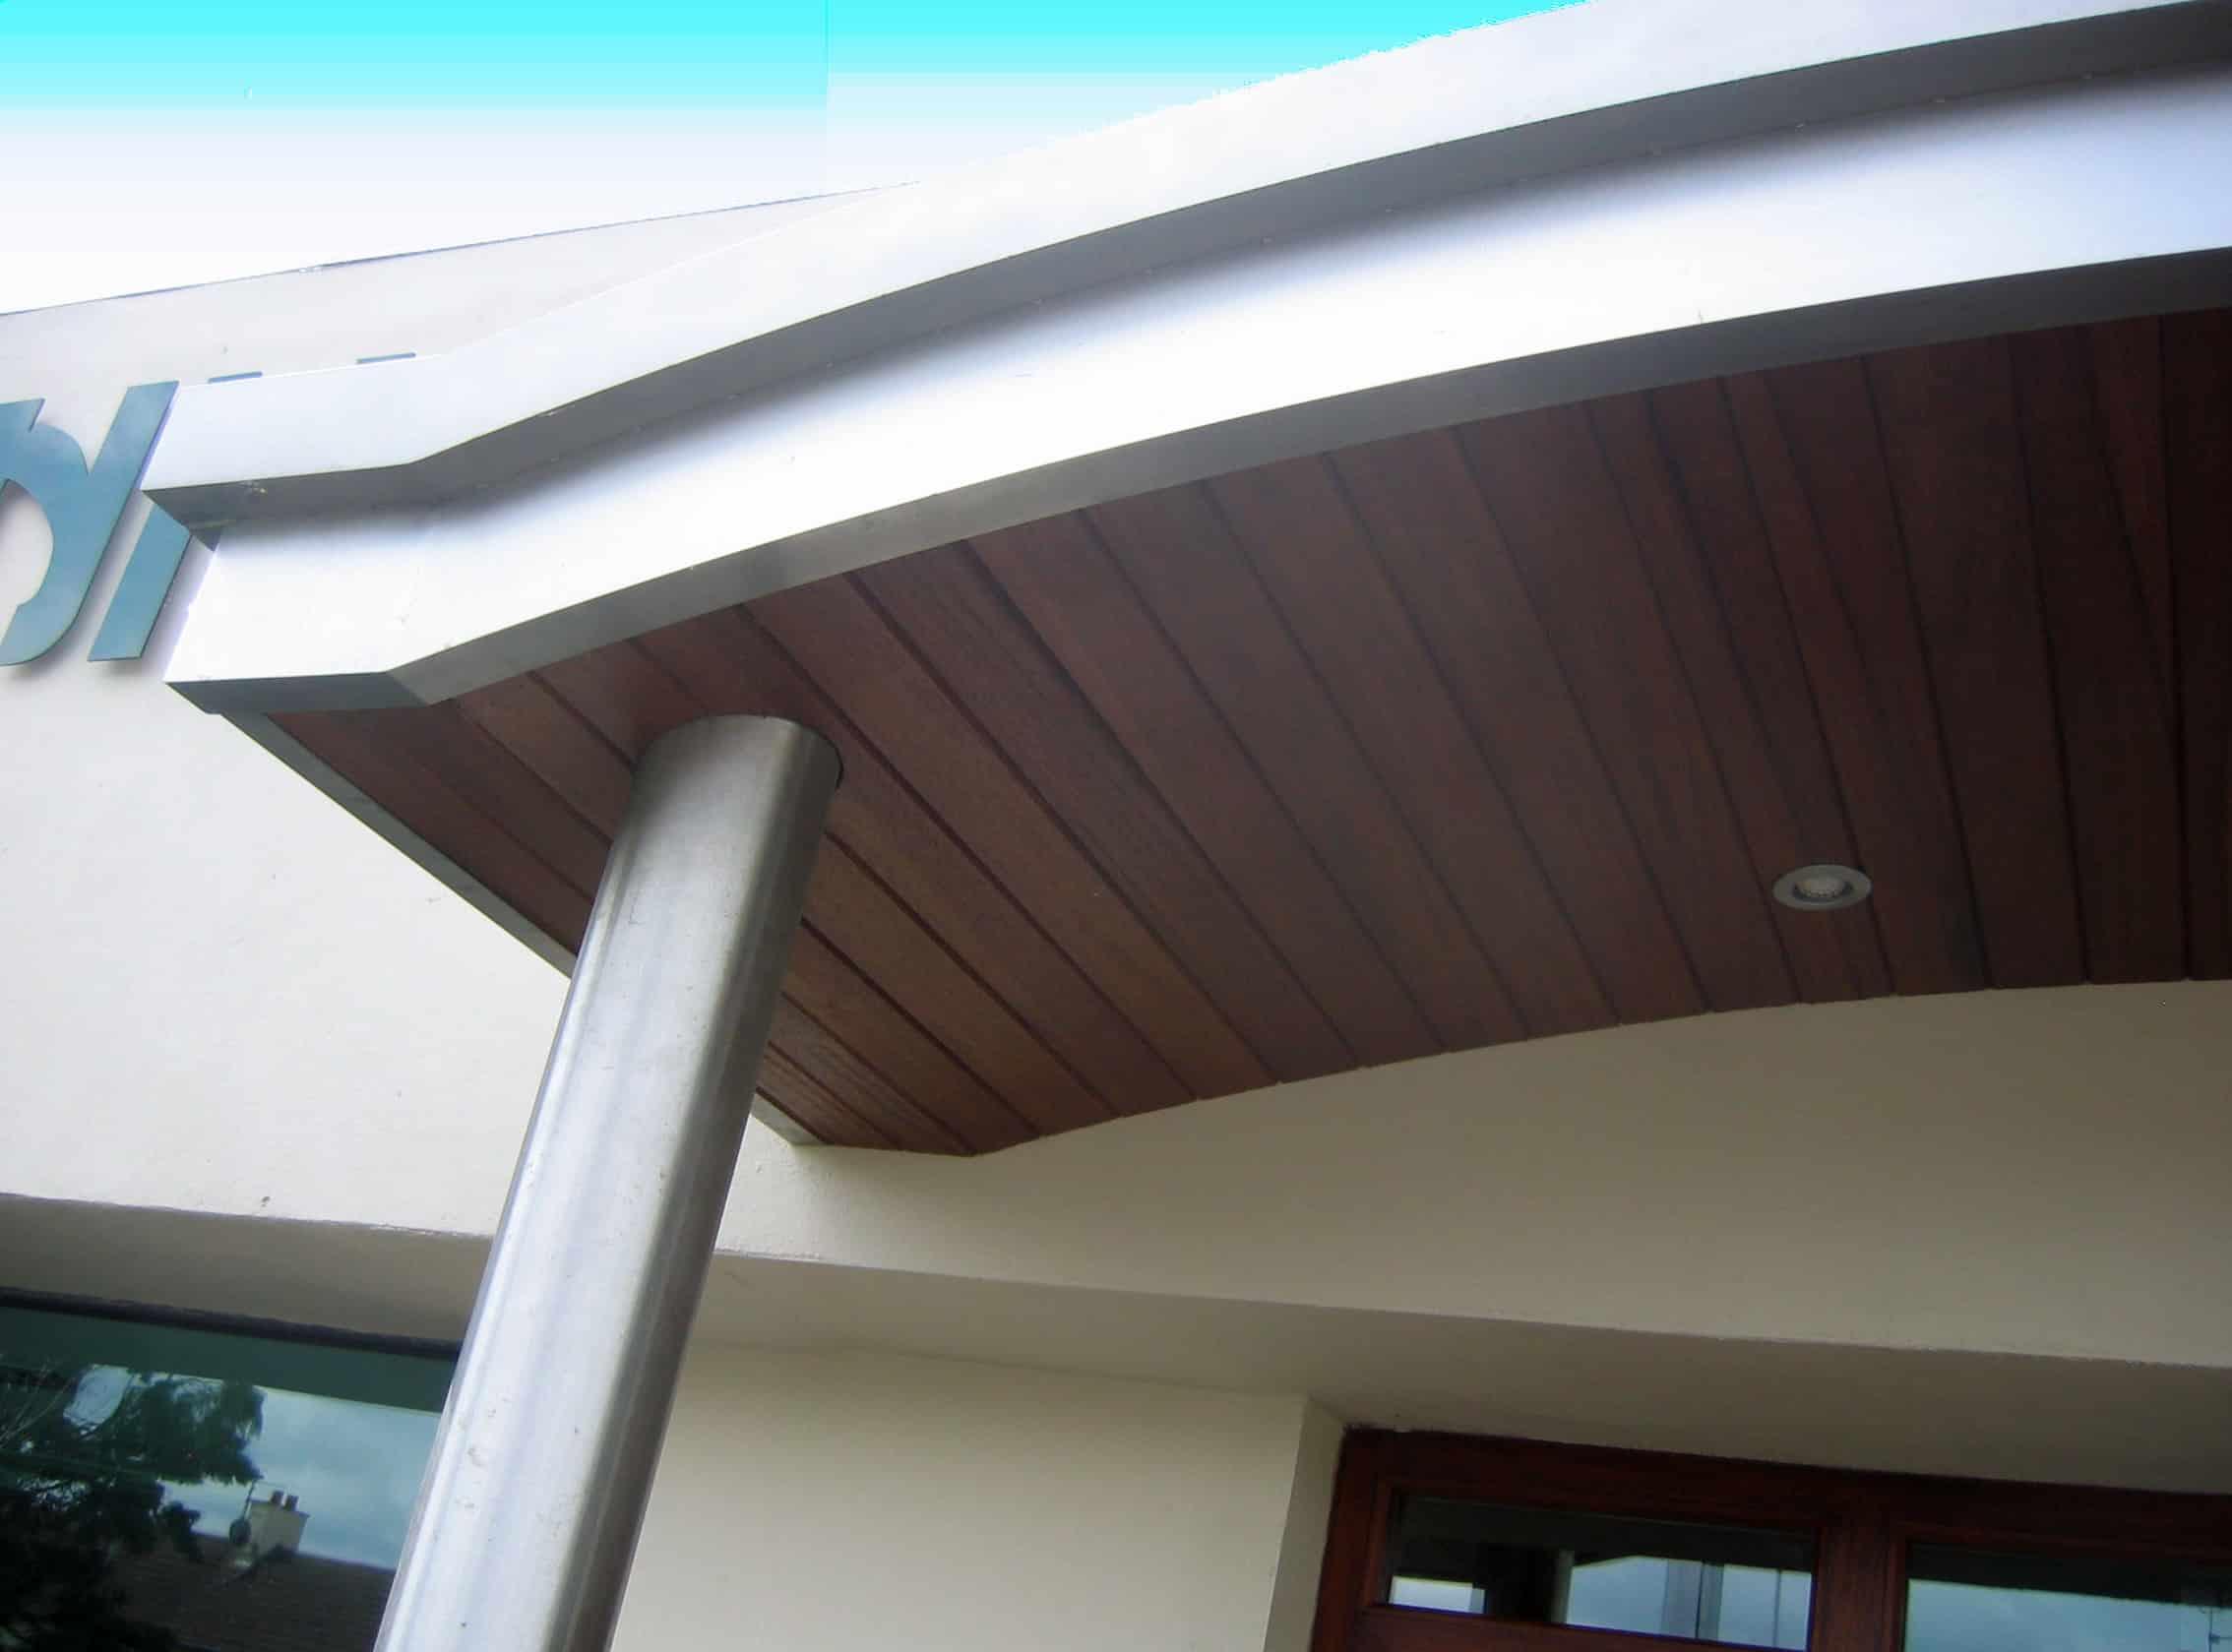 Golden inn Chinese Restaurant Ballymoney - Canopy Detail